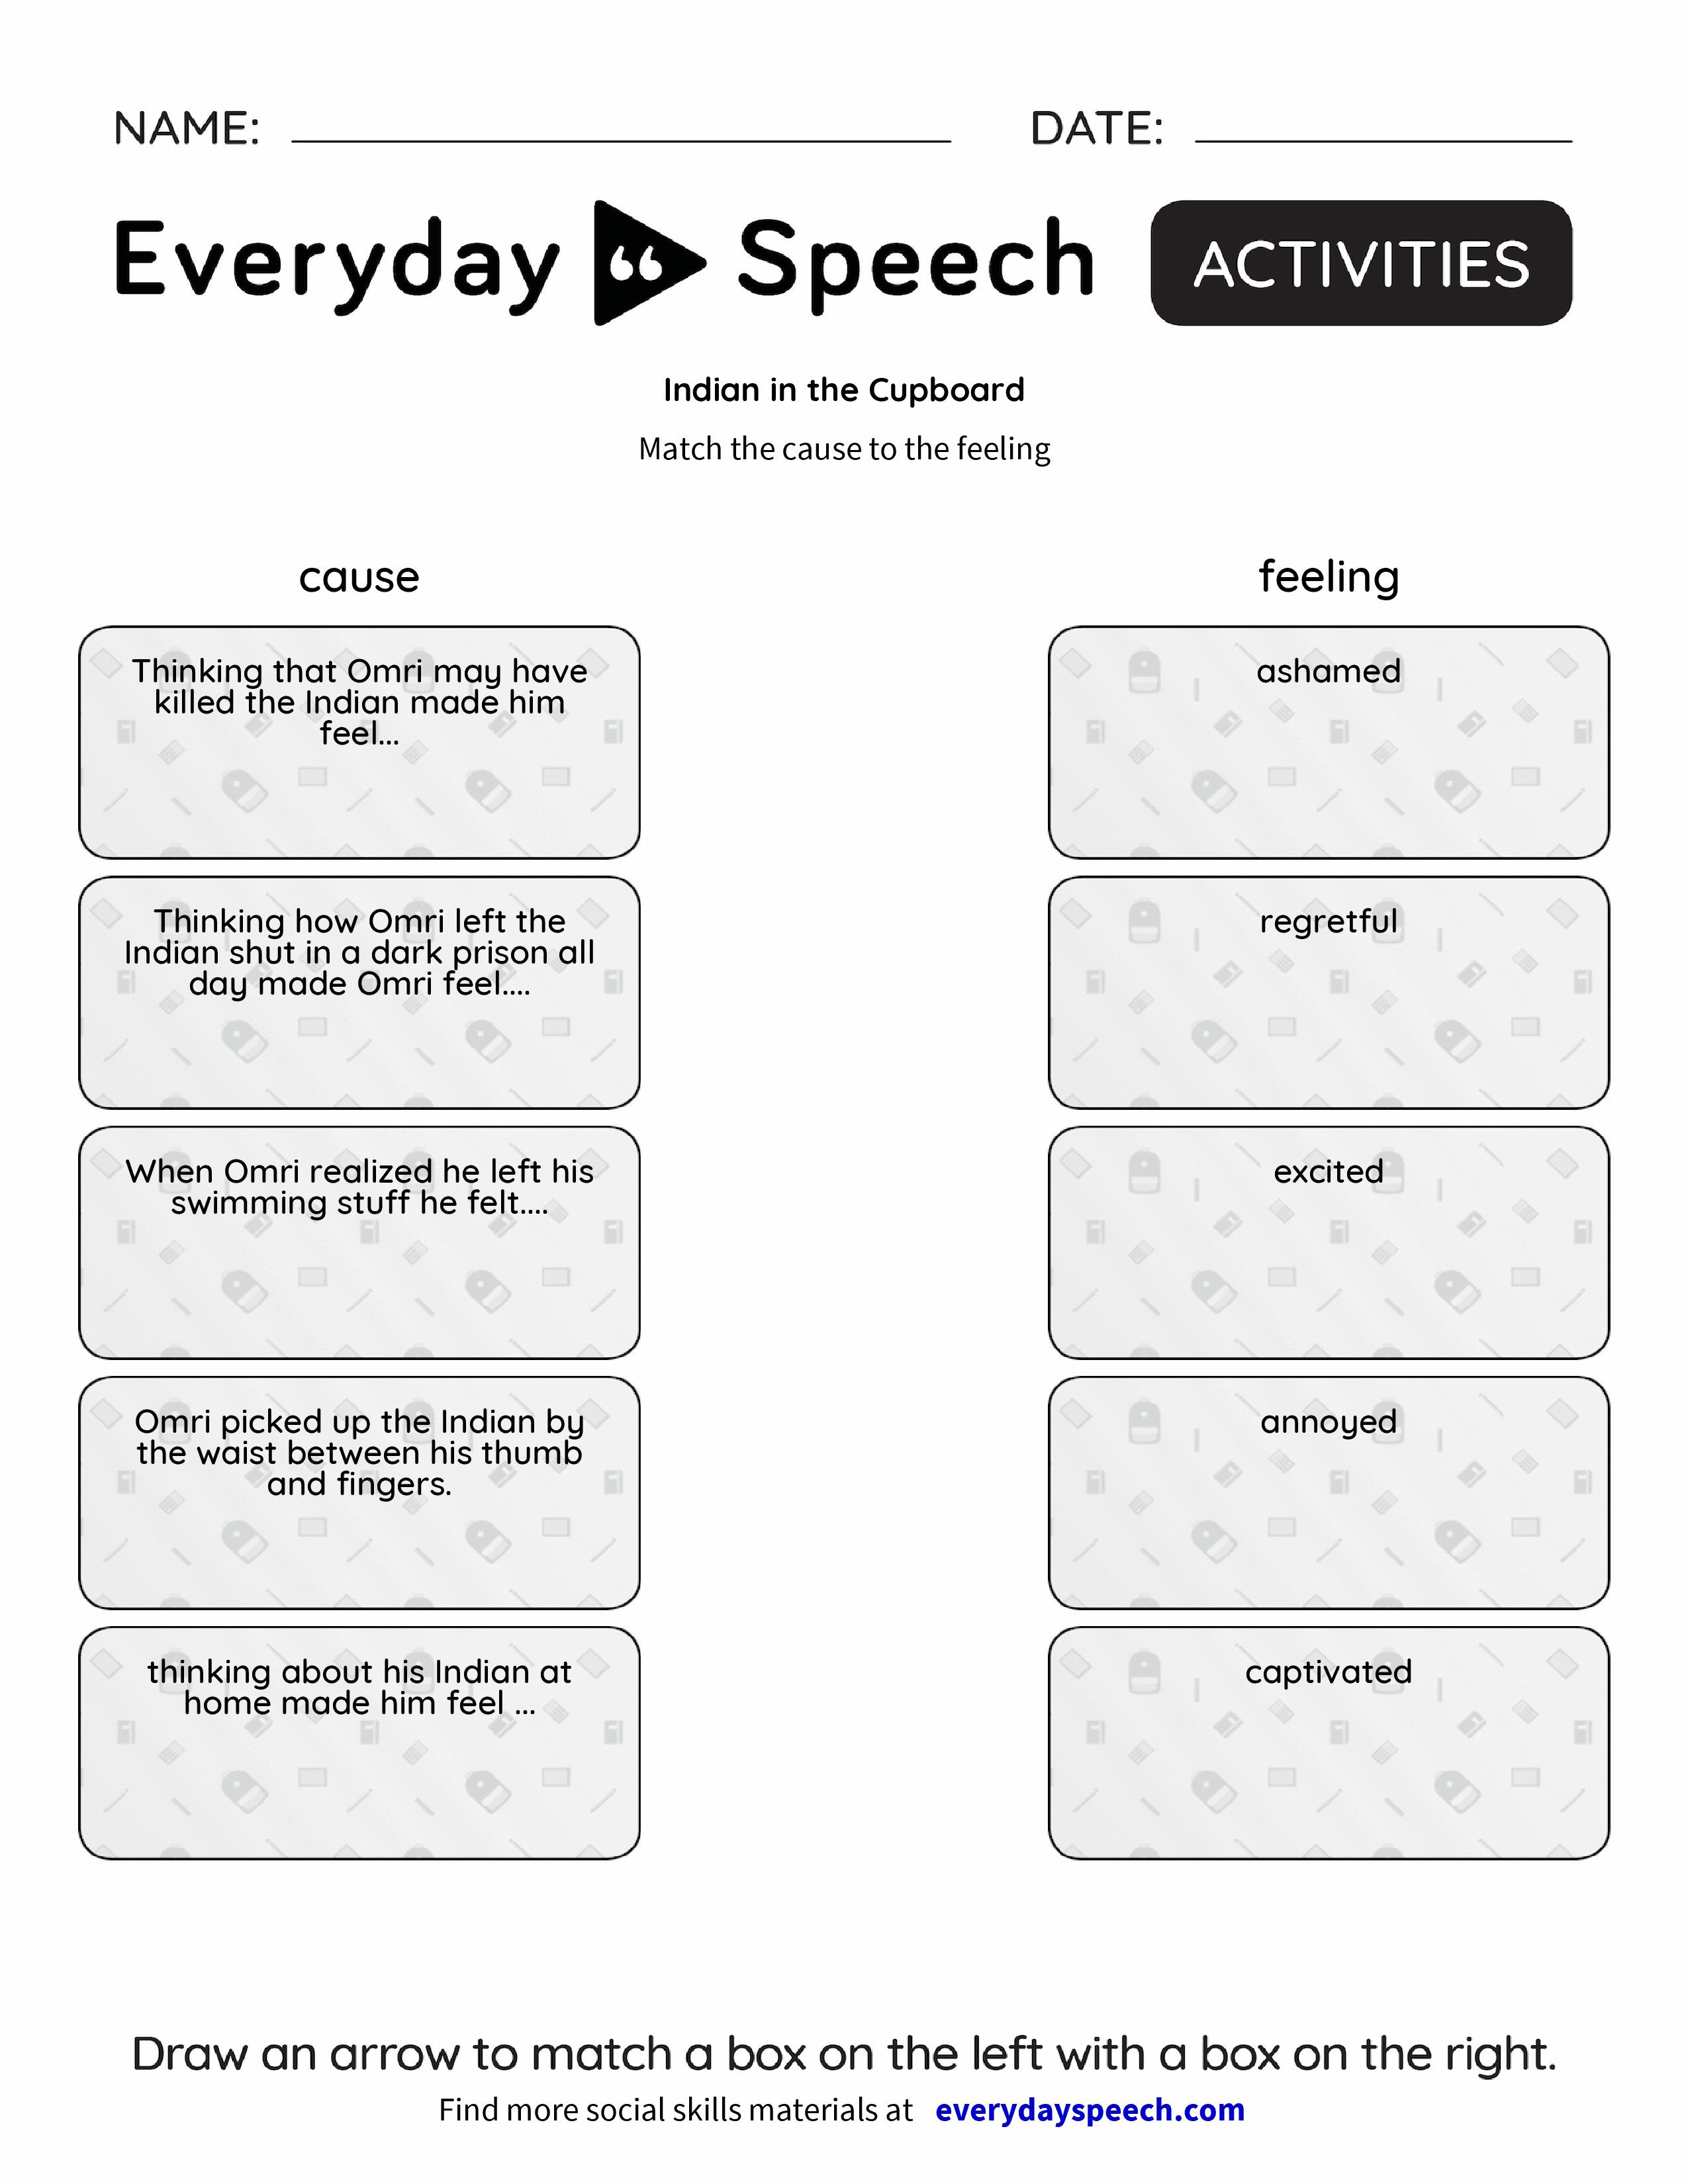 Indian In The Cupboard Everyday Speech Everyday Speech